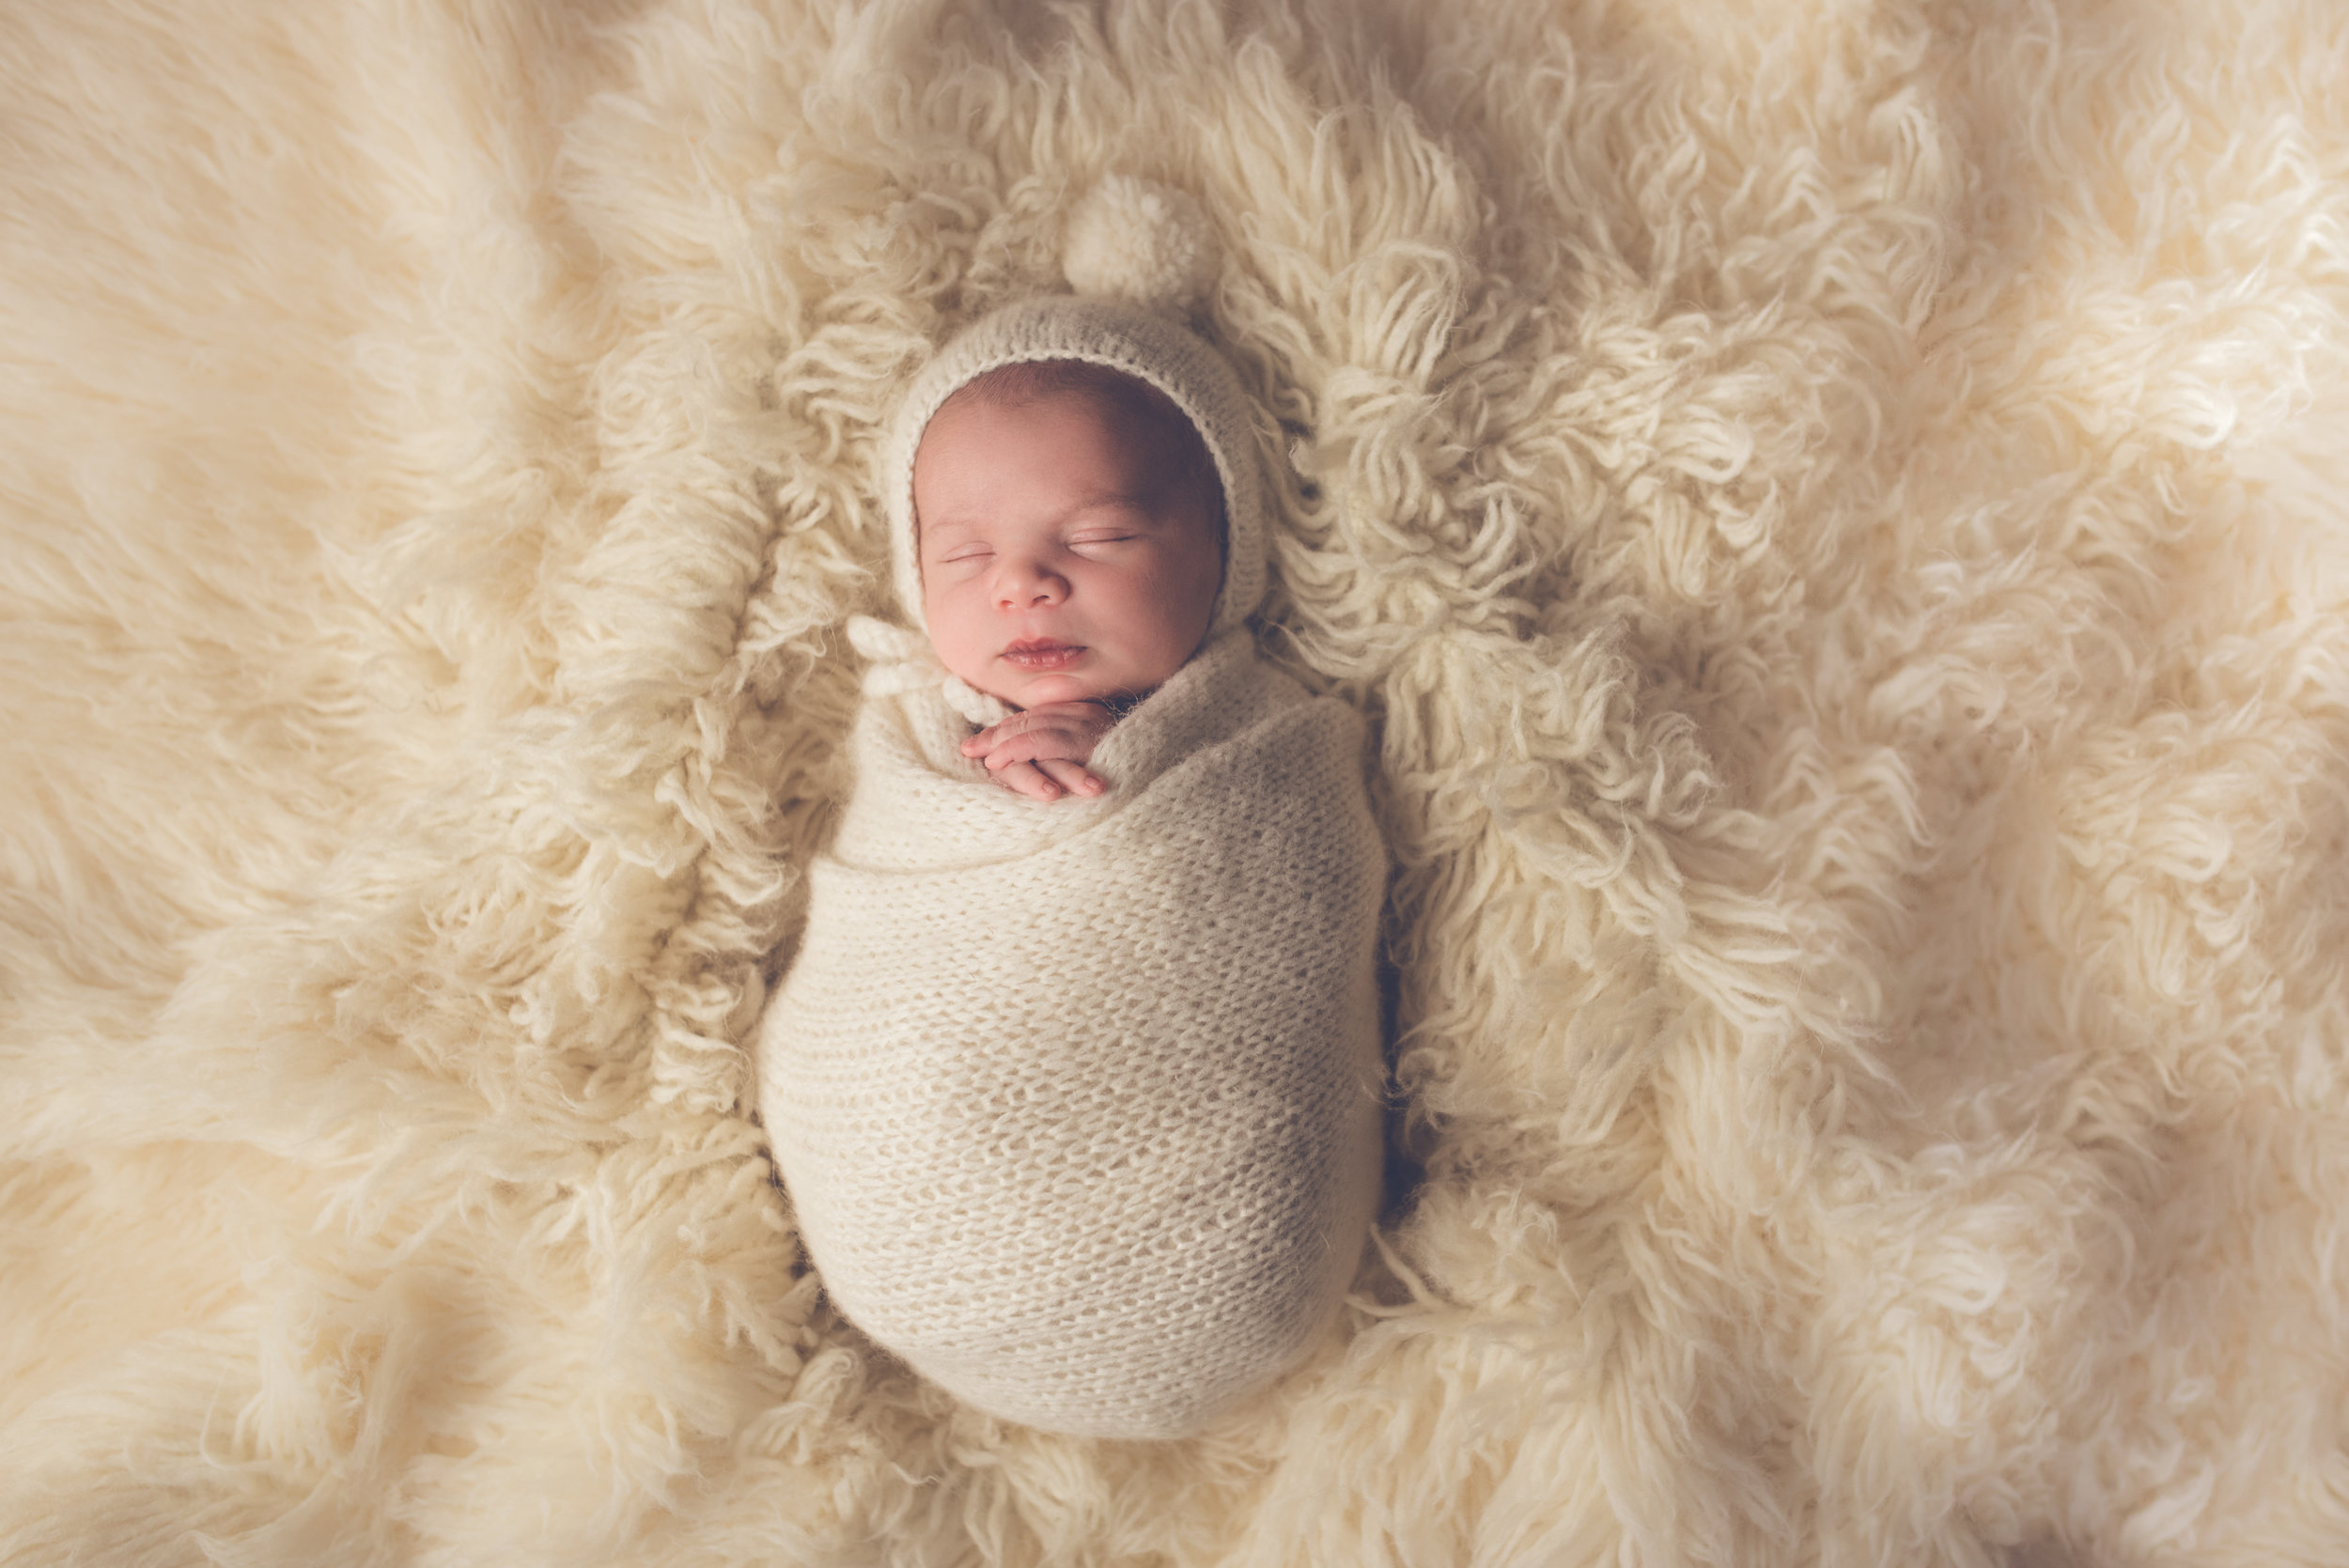 Newborn_Toby_12Days-18.jpg